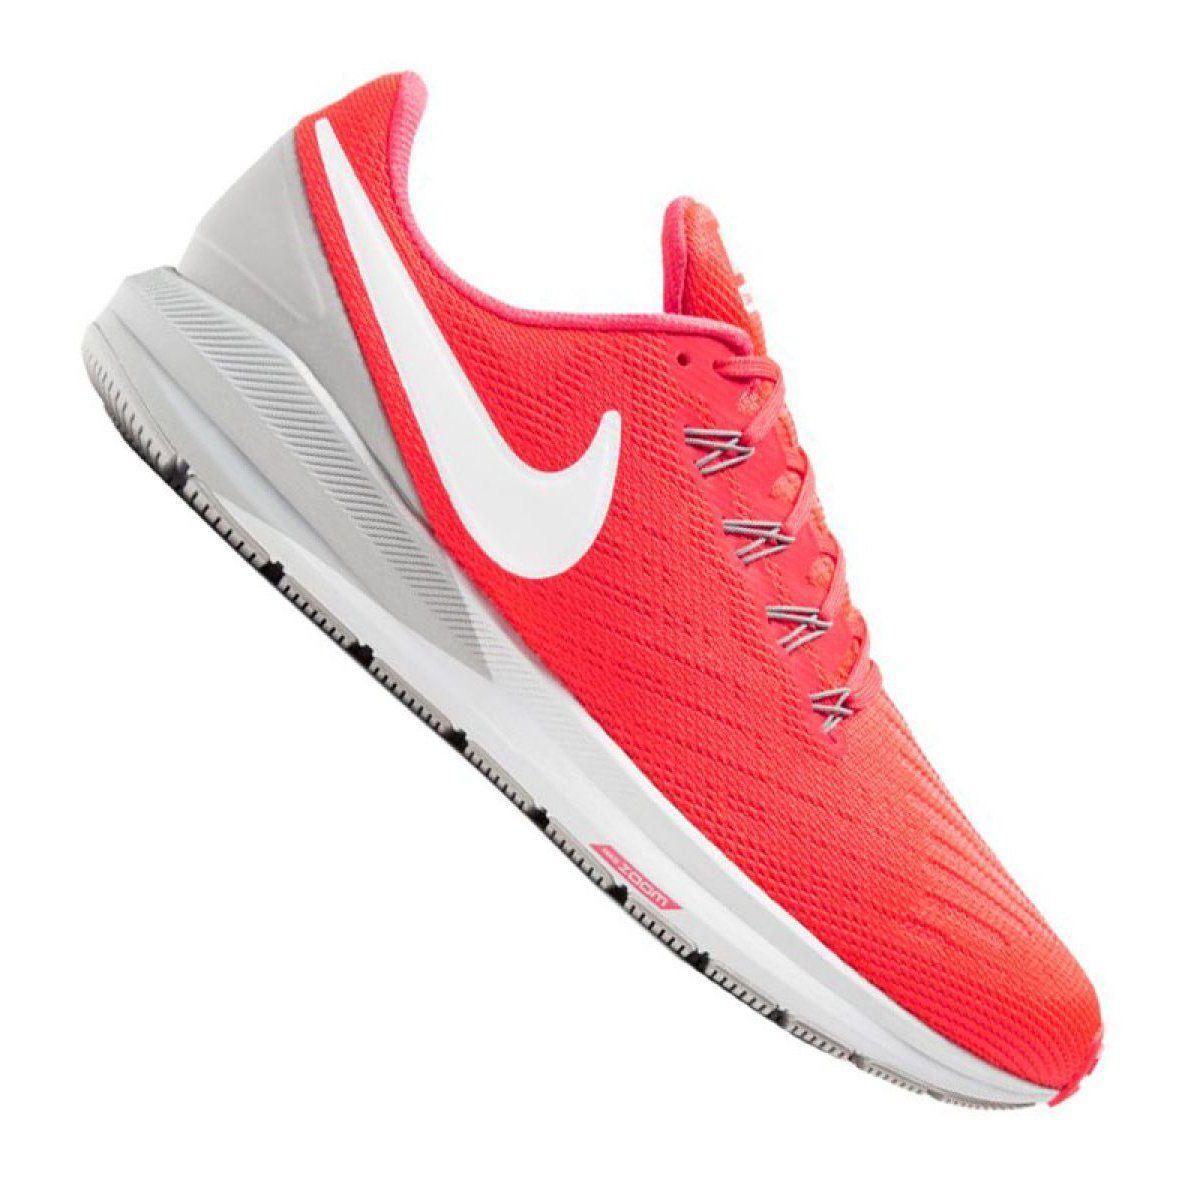 Buty Nike Air Zoom Structure 22 M AA1636601 różowe w 2020